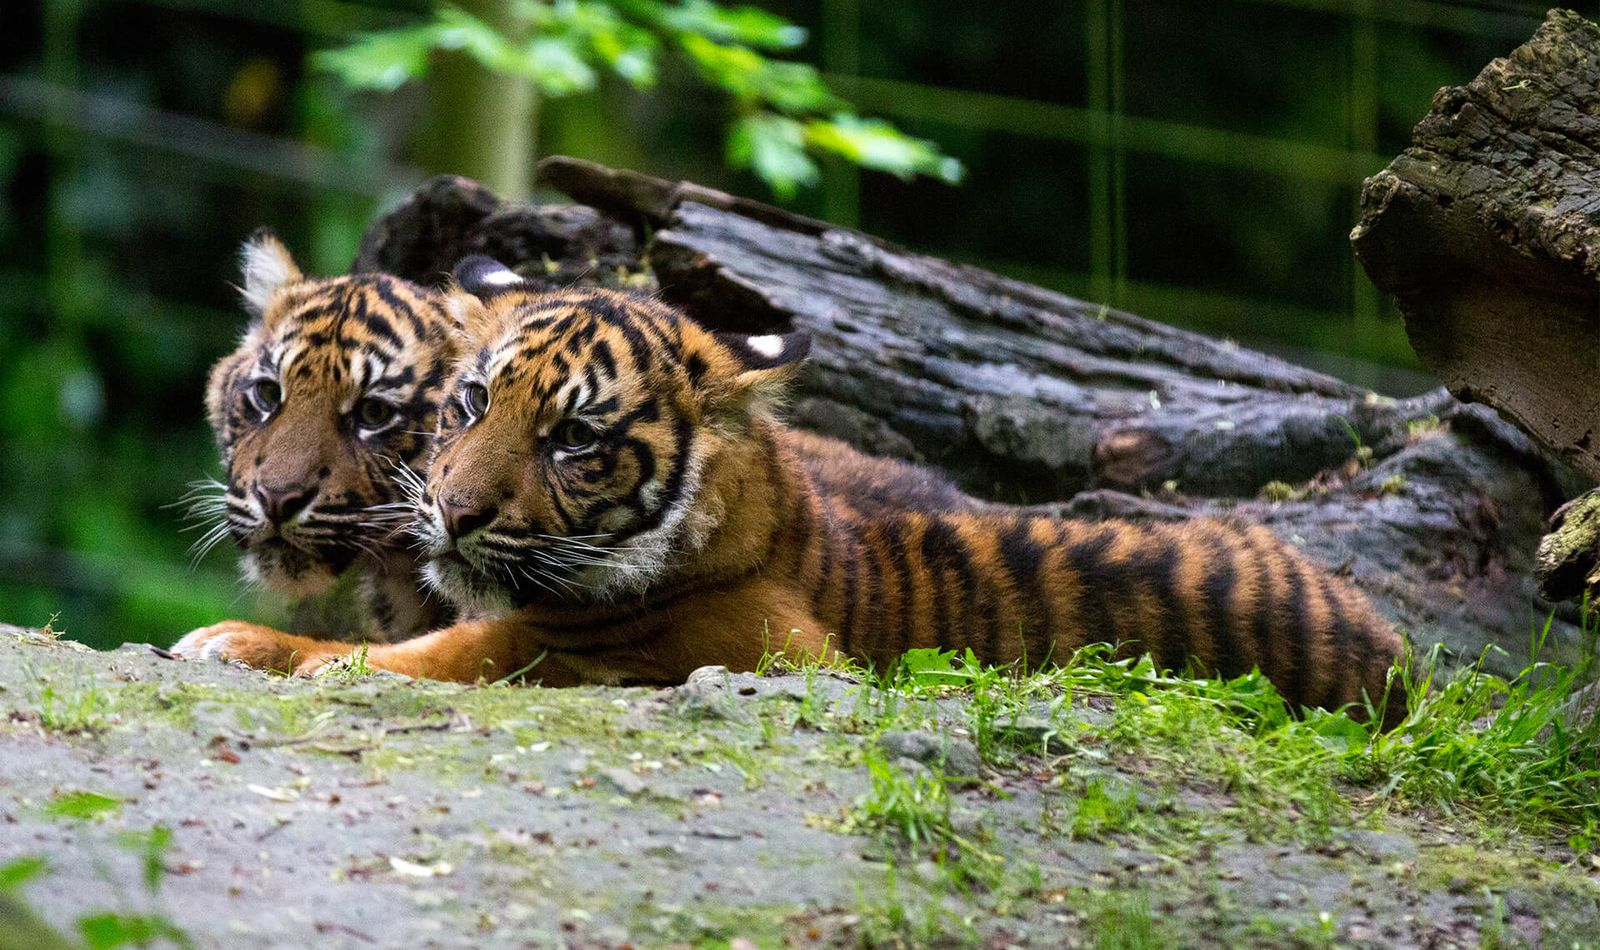 Tigres de Sumatra - Animaux extraordinaires du ZooParc